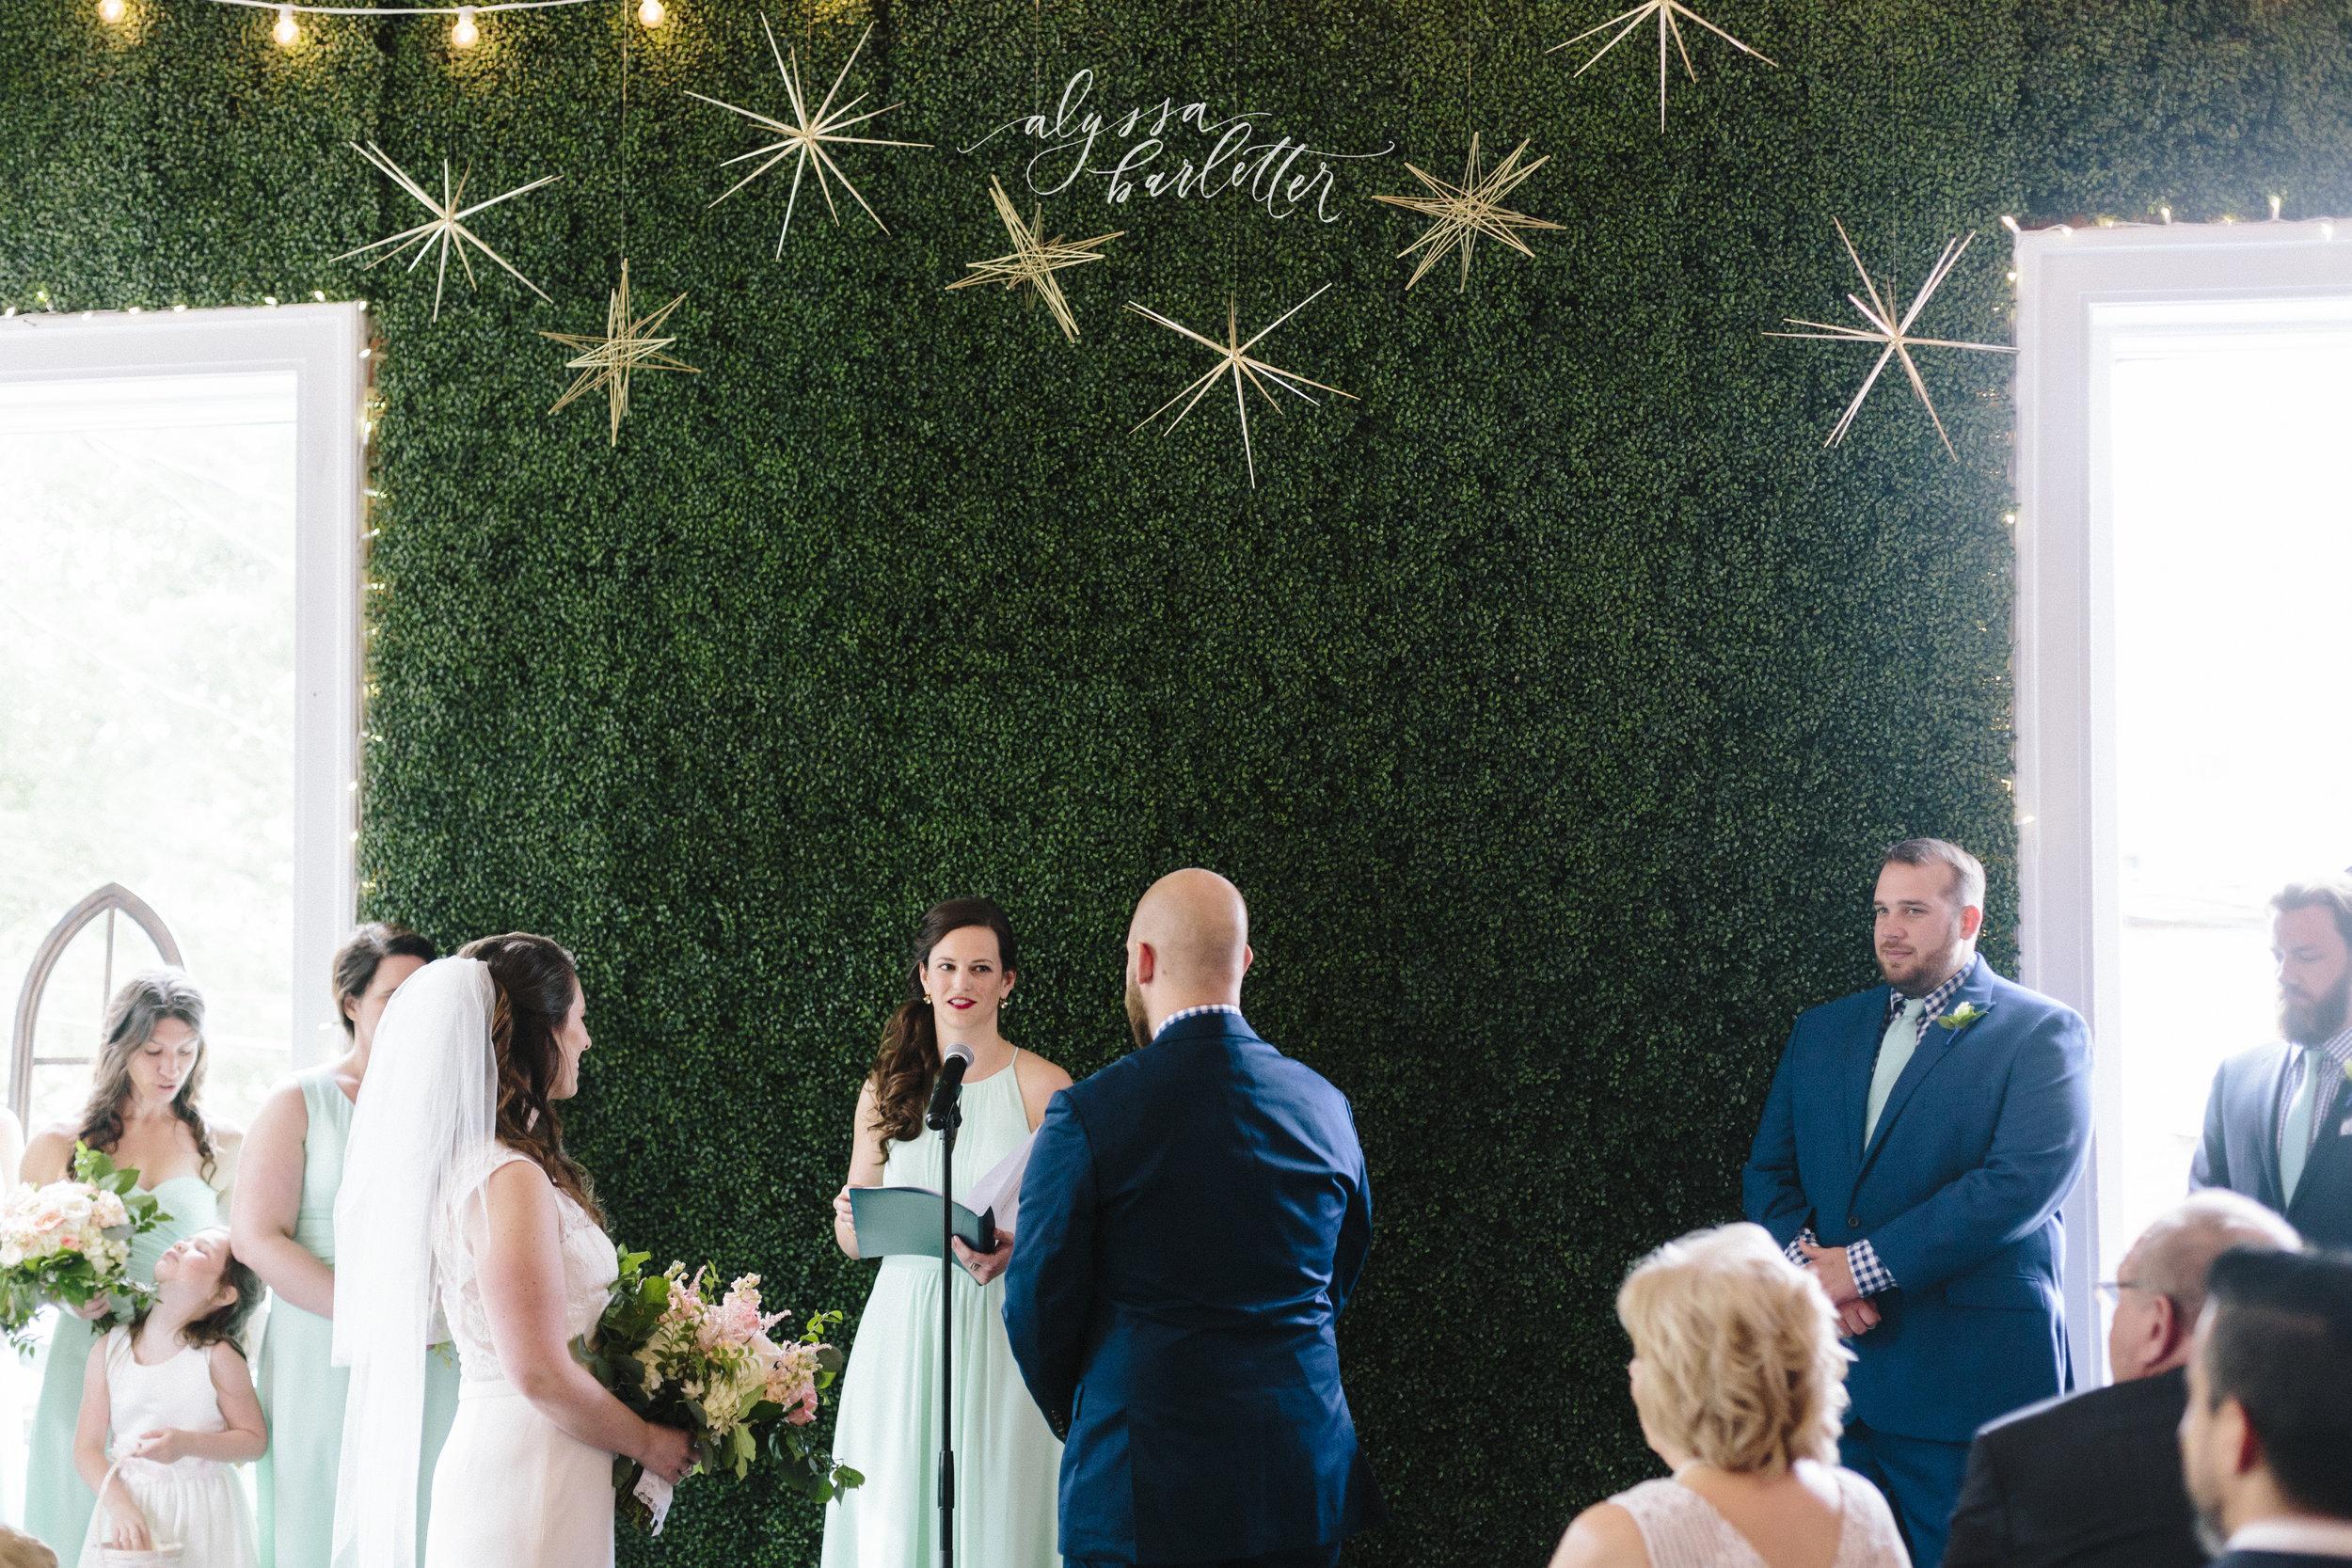 alyssa barletter photography kansas city wedding 2016 main courtney and brian-1-18.jpg